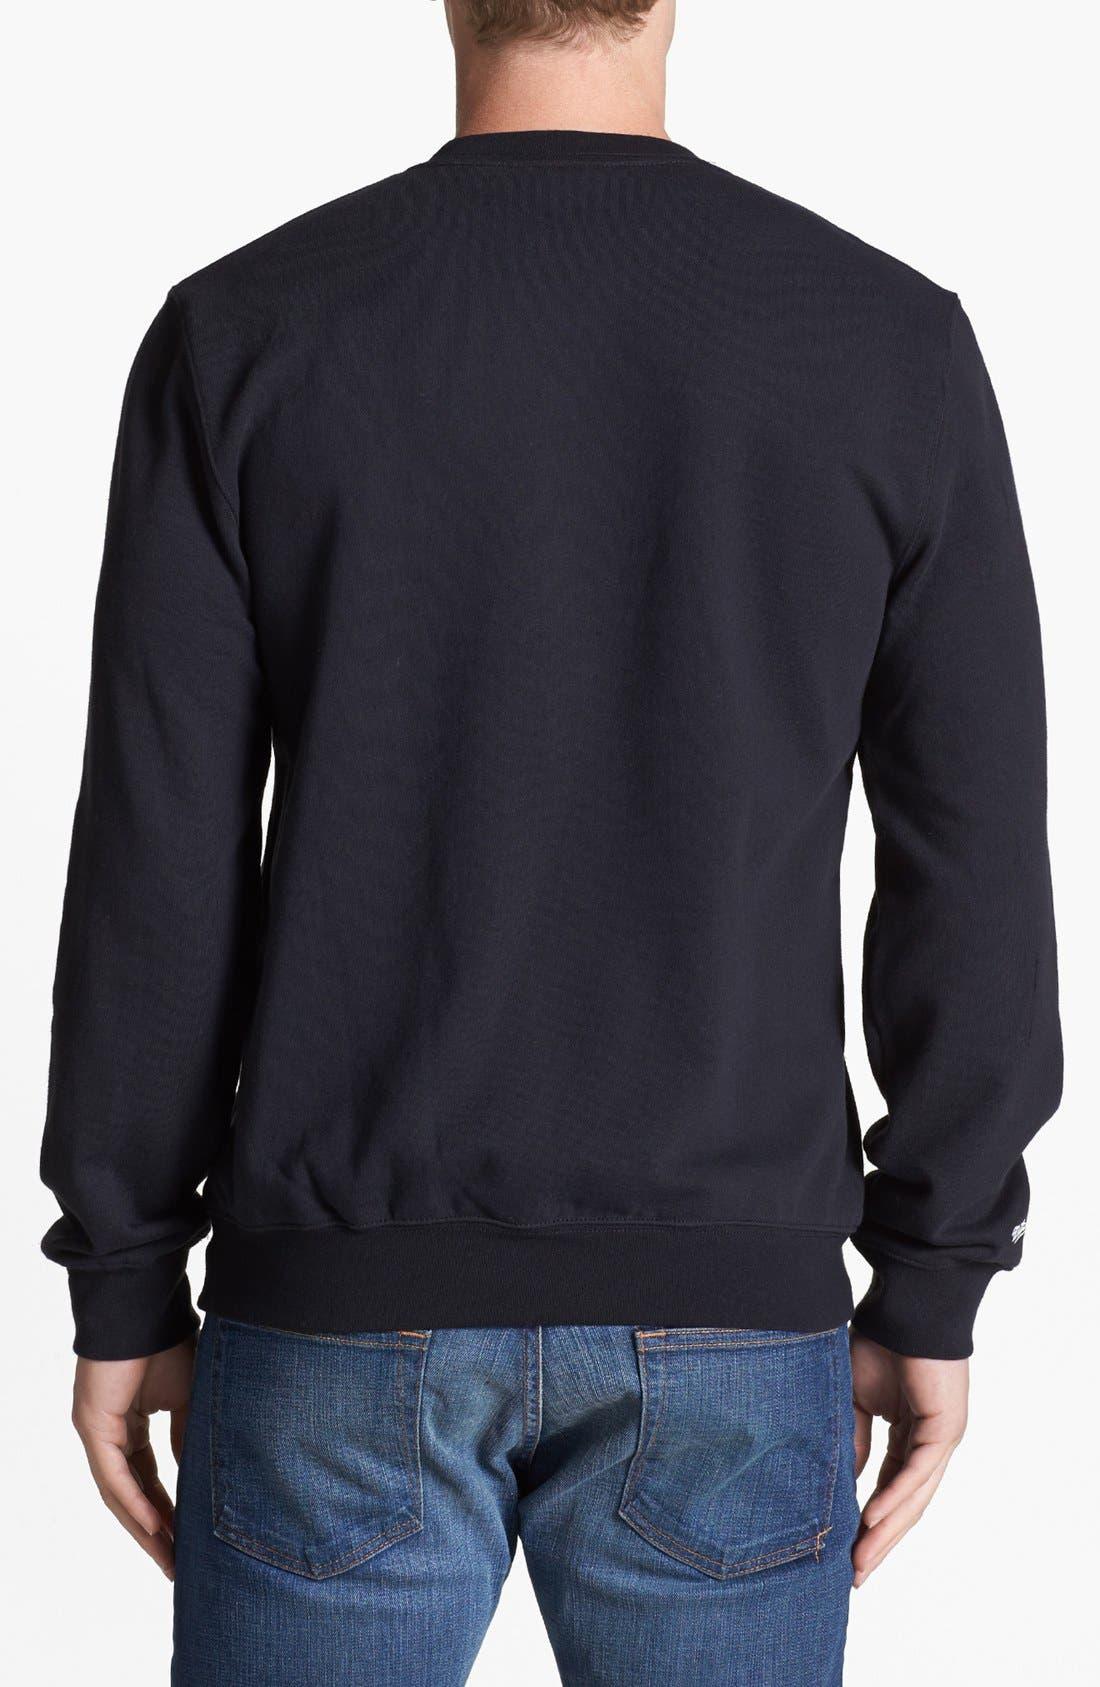 Alternate Image 2  - Mitchell & Ness 'Toronto Raptors' Sweatshirt